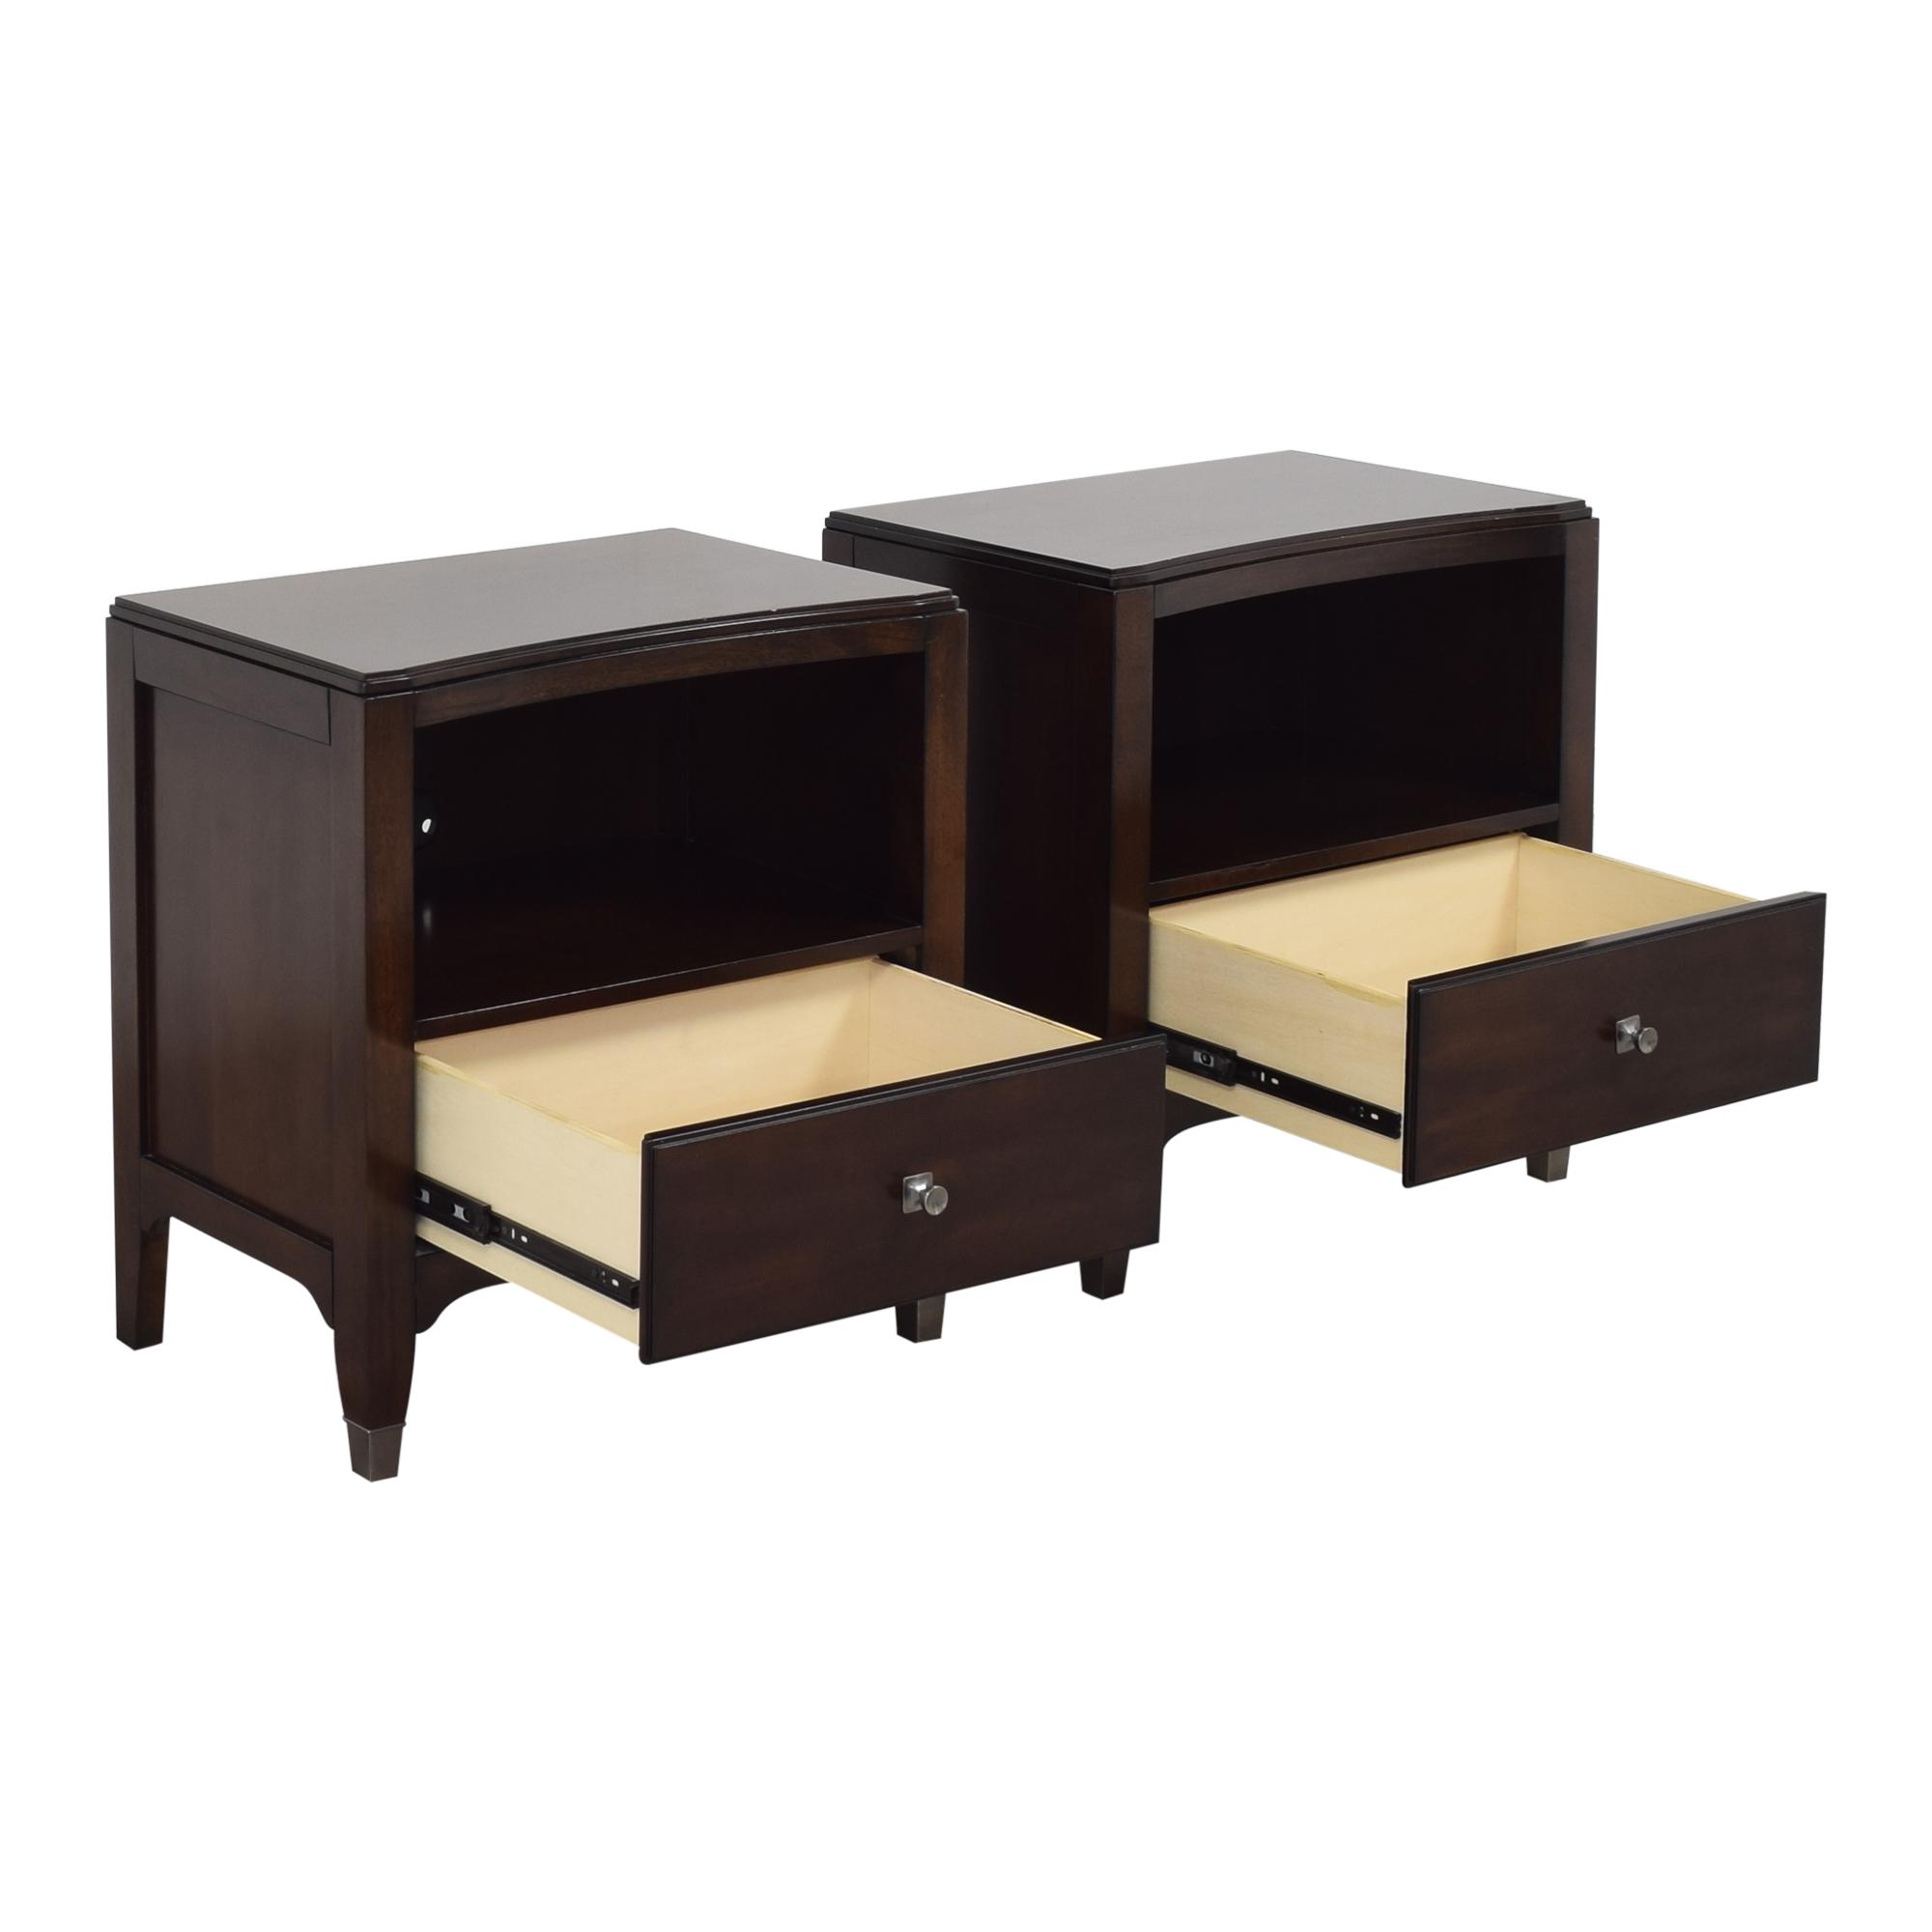 Bassett Furniture Bassett Furniture Cosmopolitan Nightstands Tables